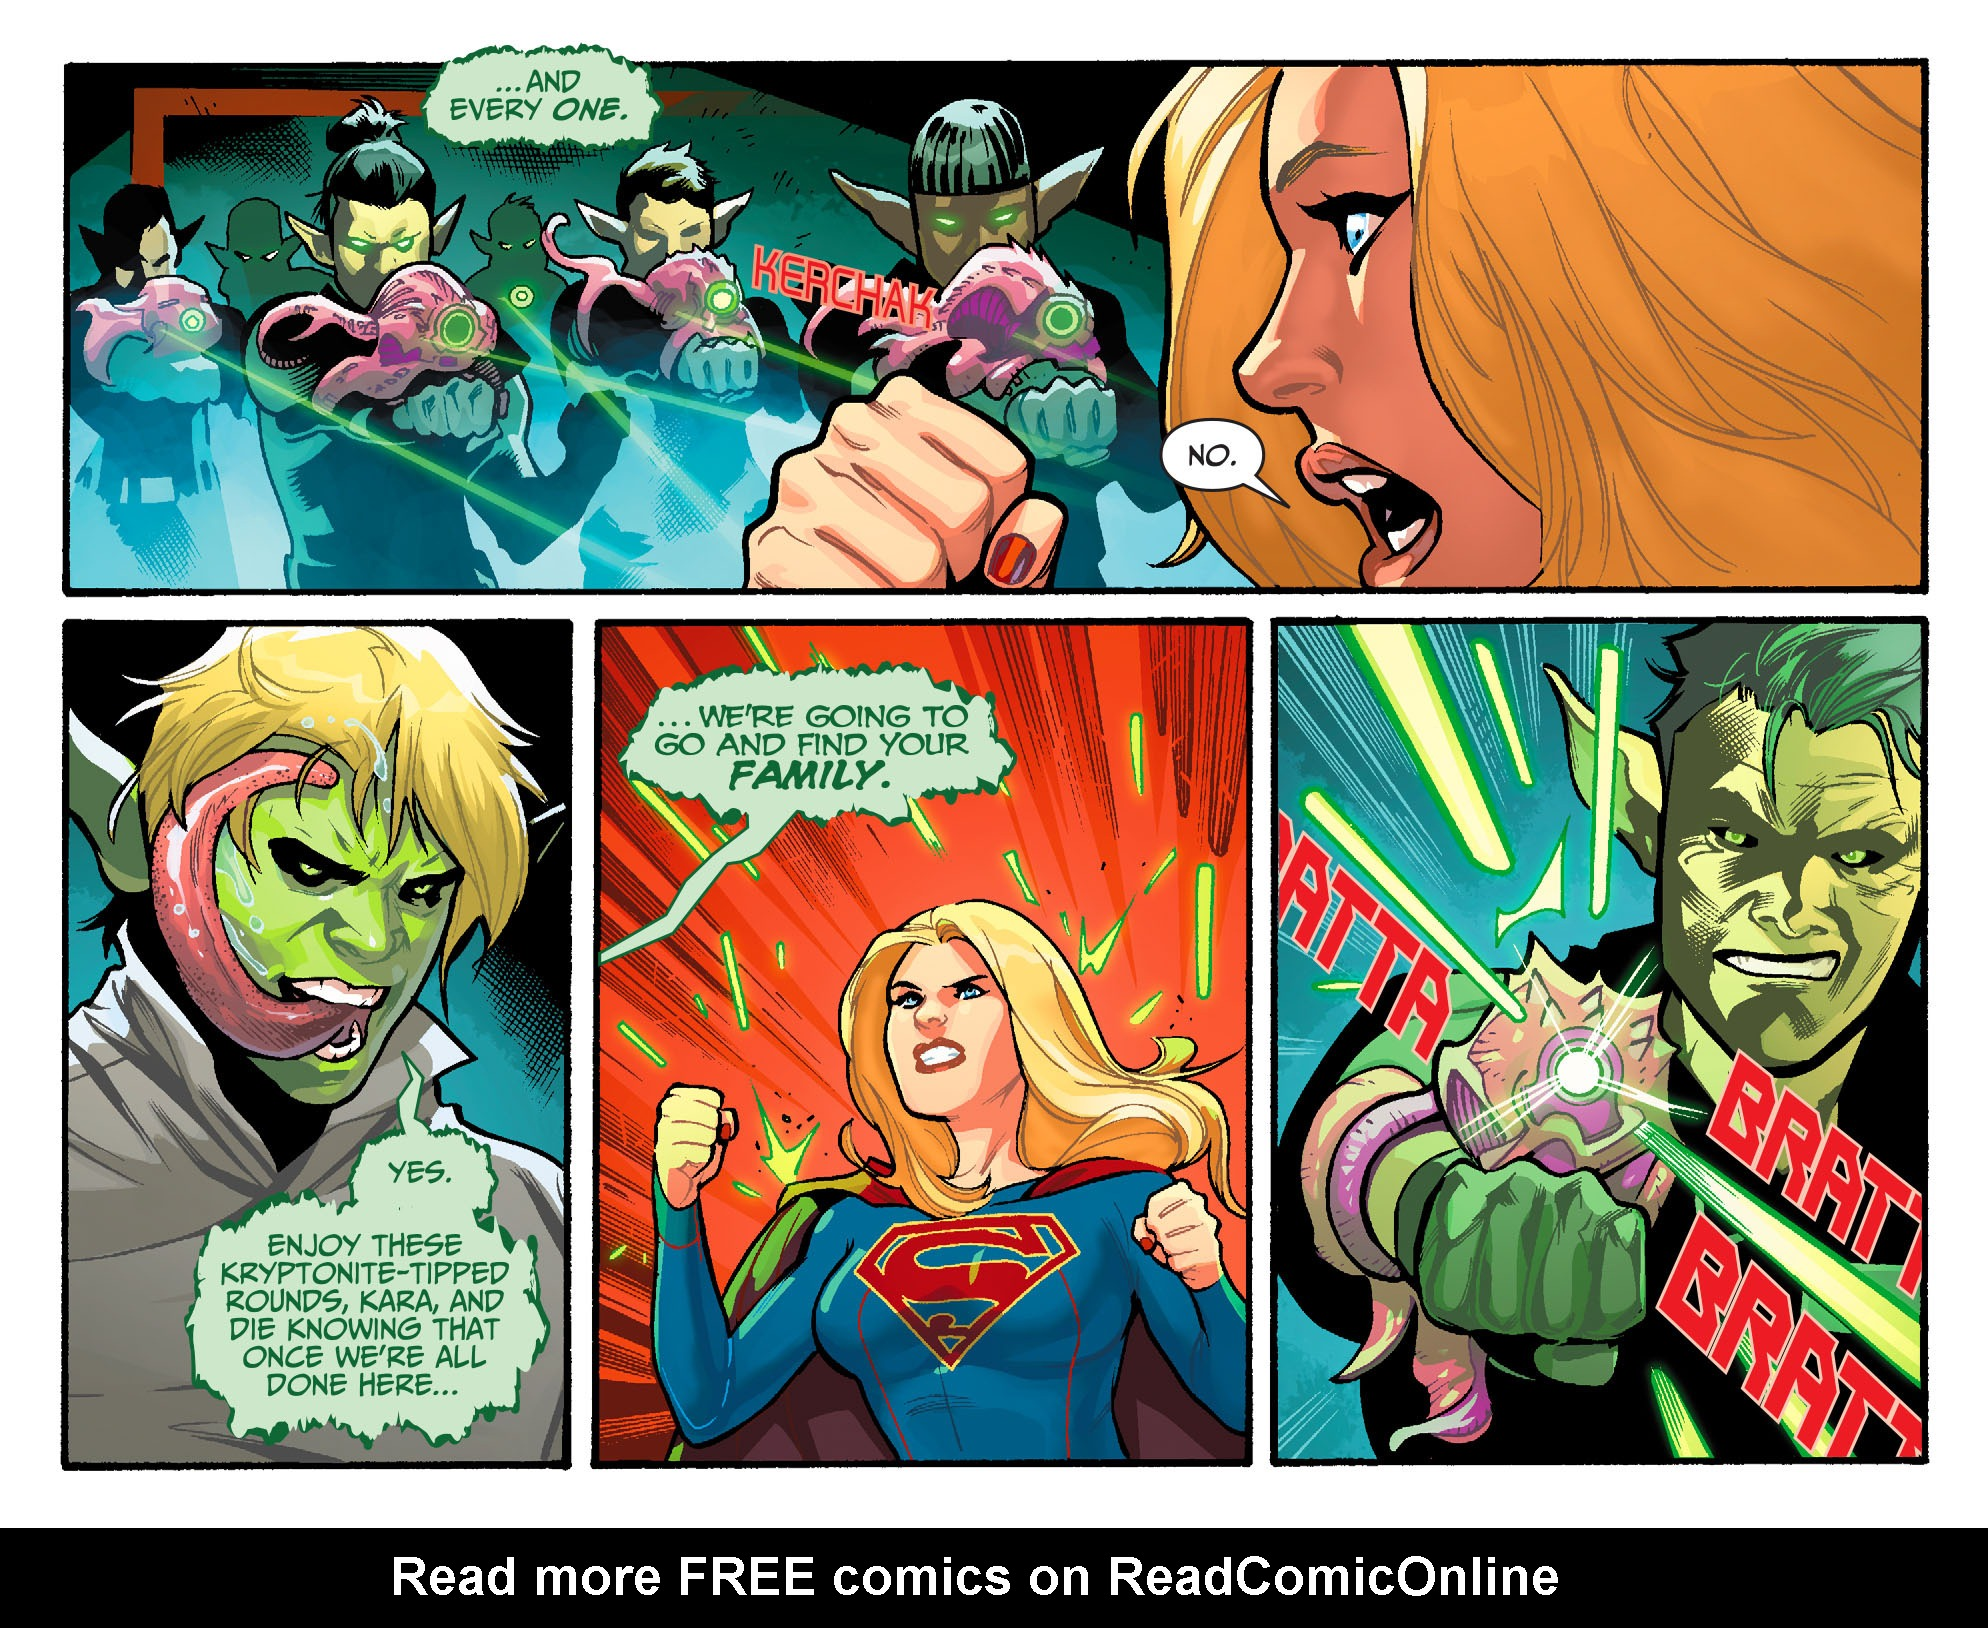 Read online Adventures of Supergirl comic -  Issue #6 - 10